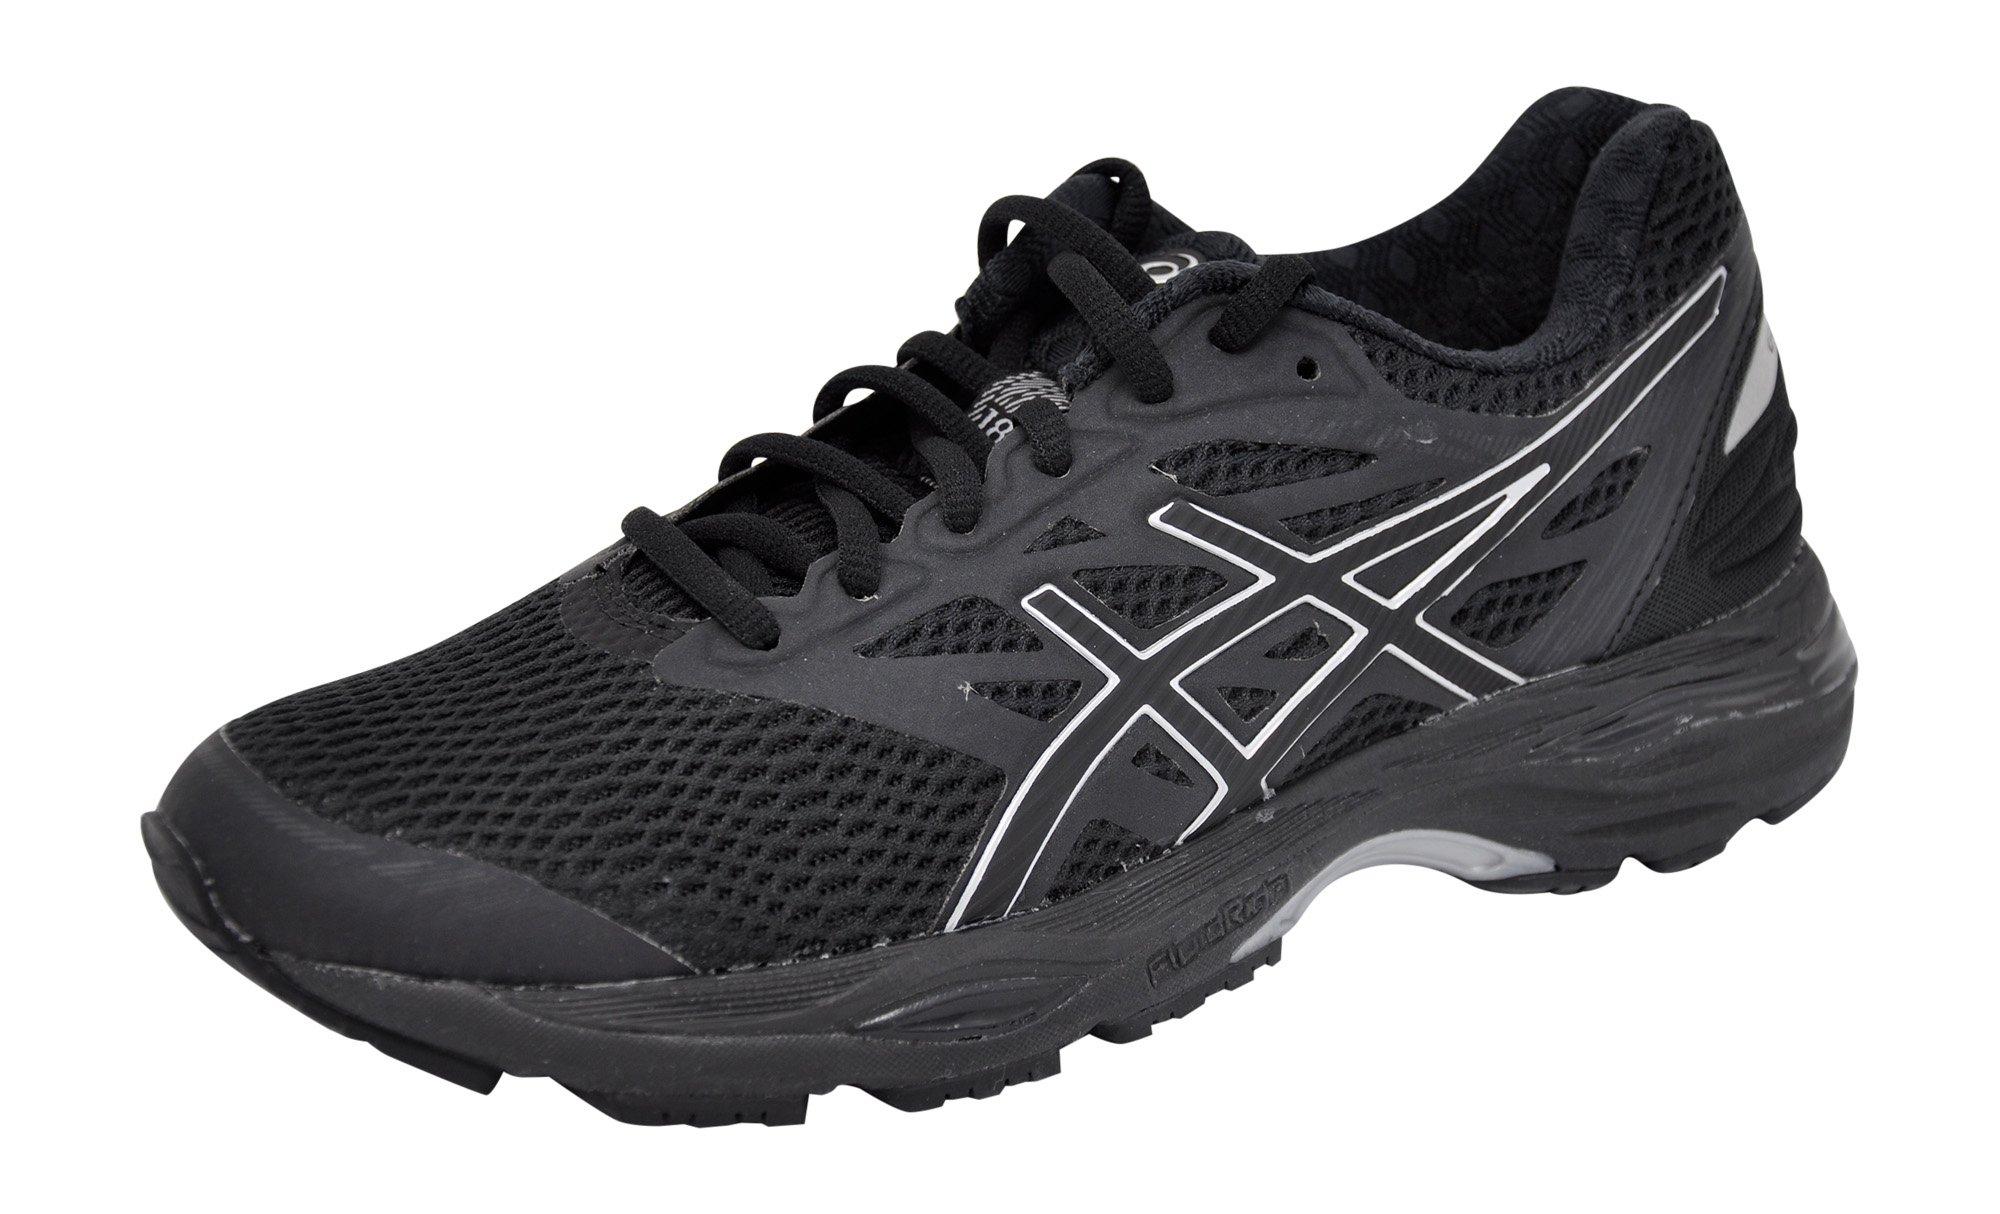 ASICS Women's Gel-Cumulus 18 Running Shoe (9.5 B(M) US, Black/Silver/Black) by ASICS